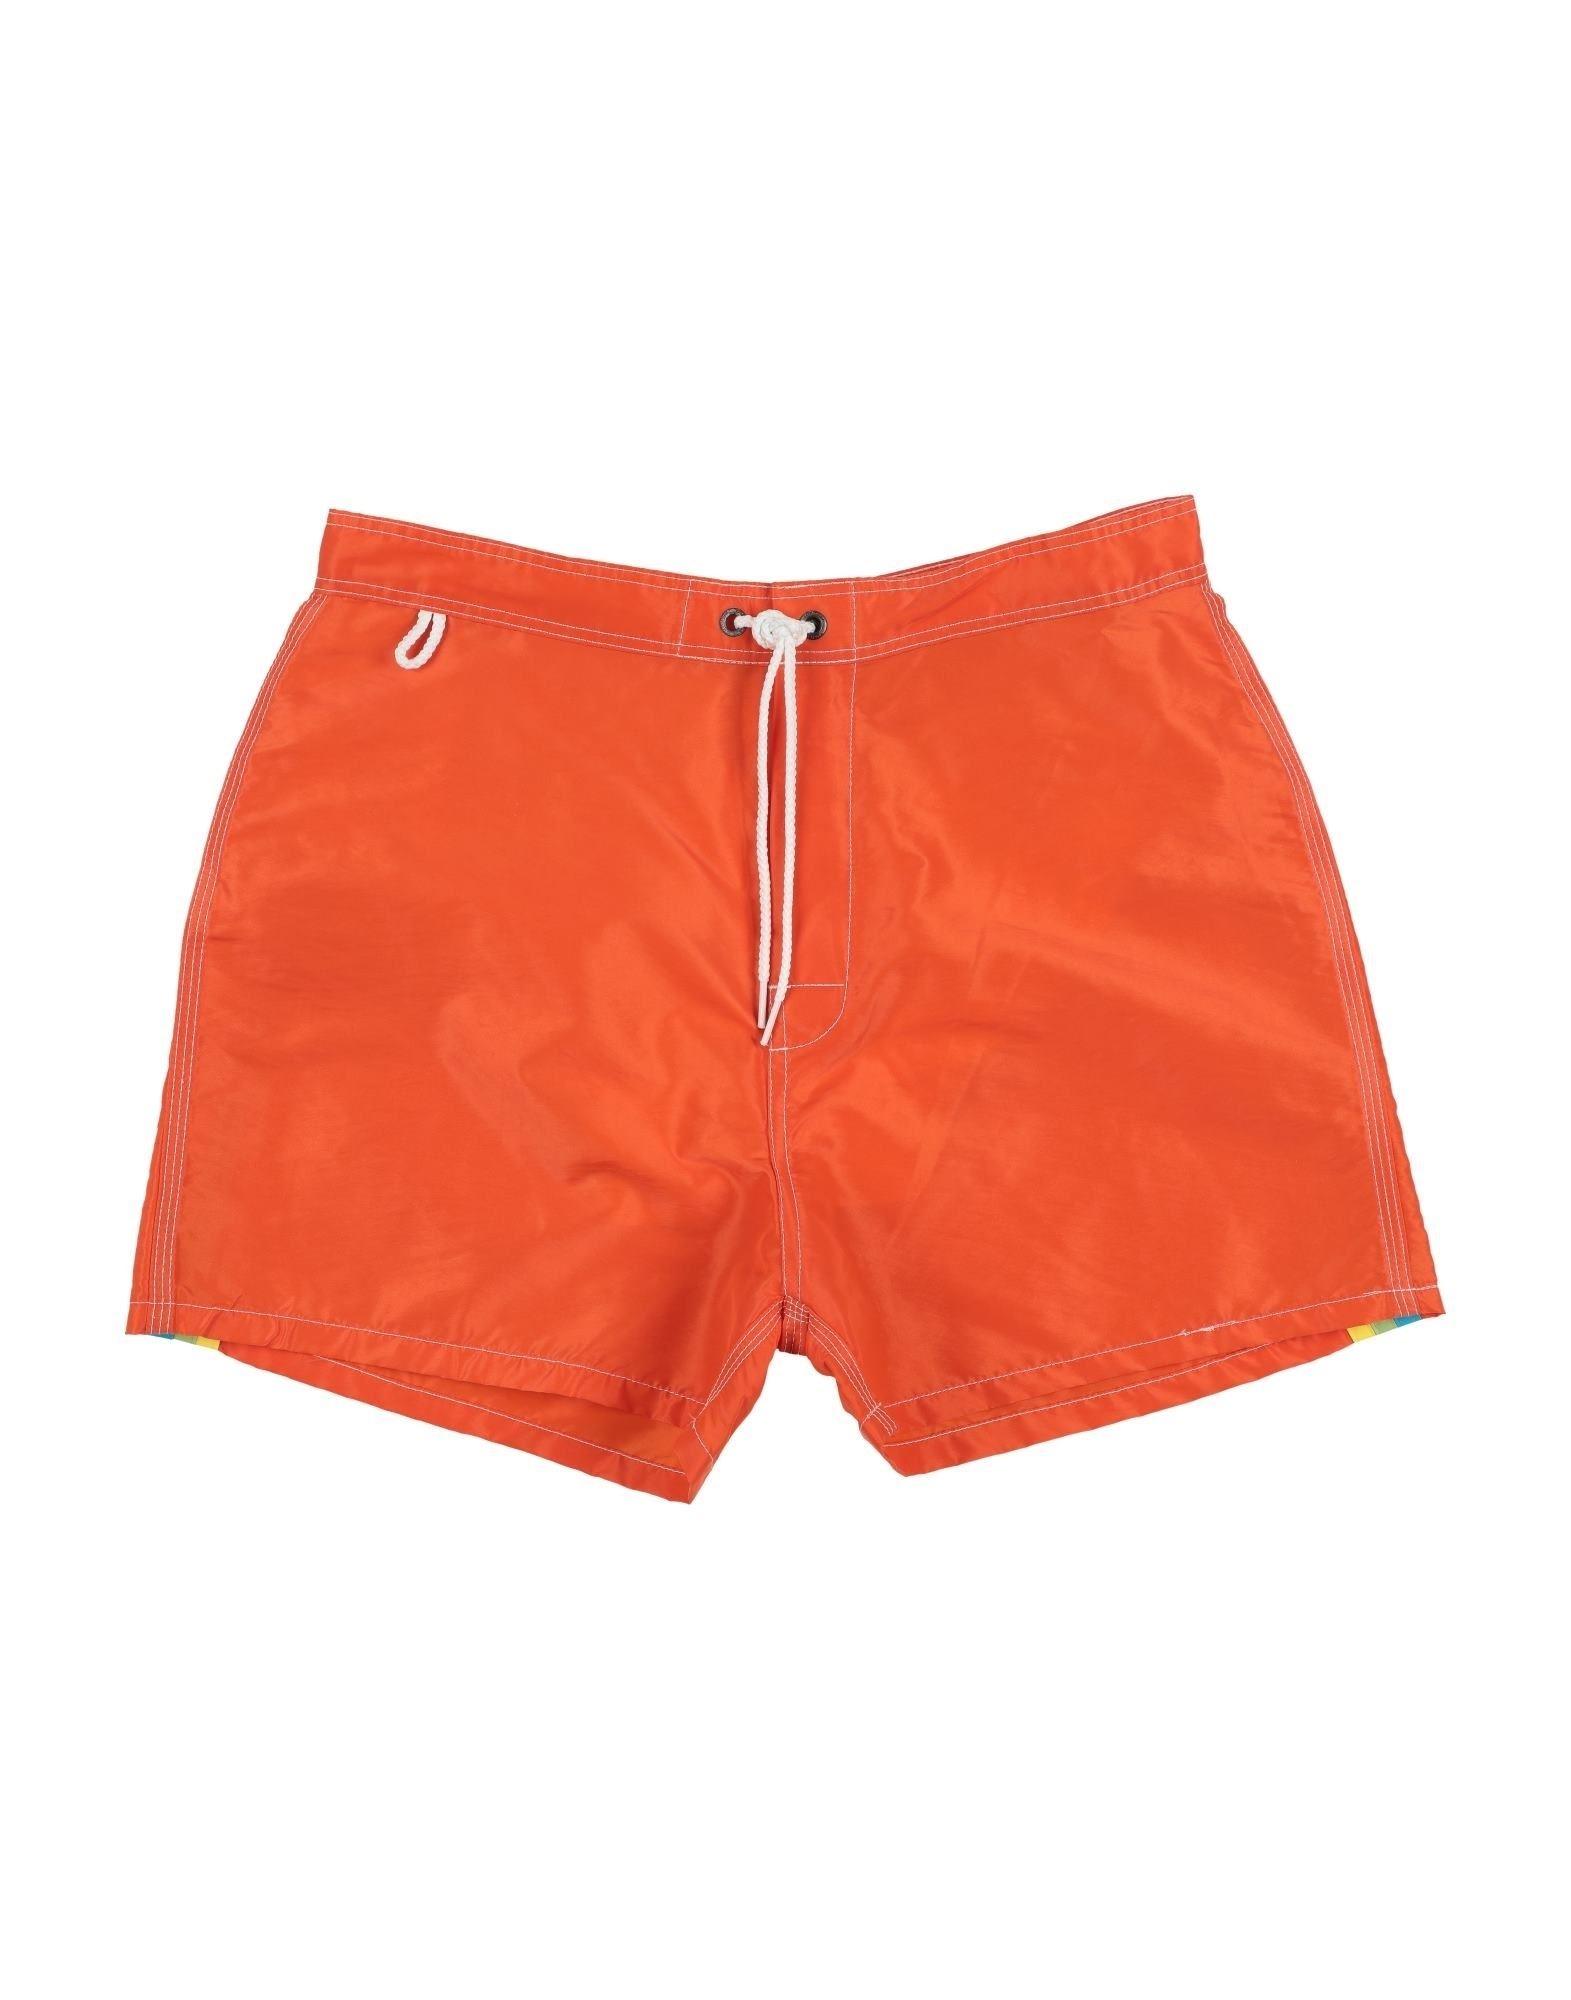 SUNDEK Swim trunks - Item 47277072